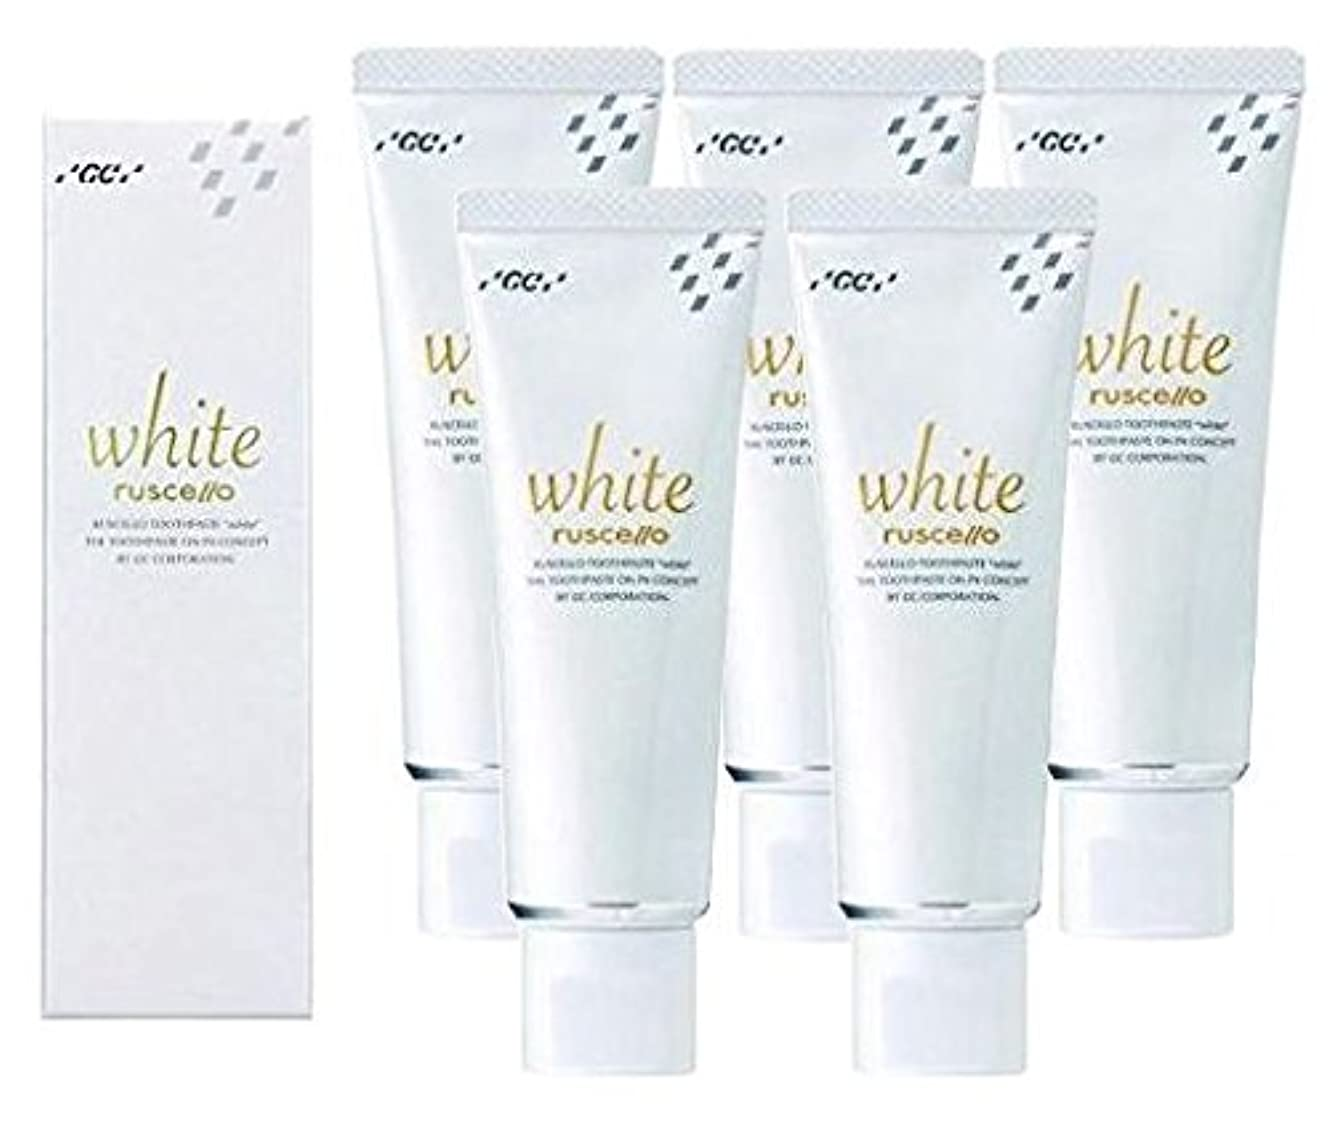 GC ルシェロ 歯みがきペースト ホワイト 100g × 5本 医薬部外品